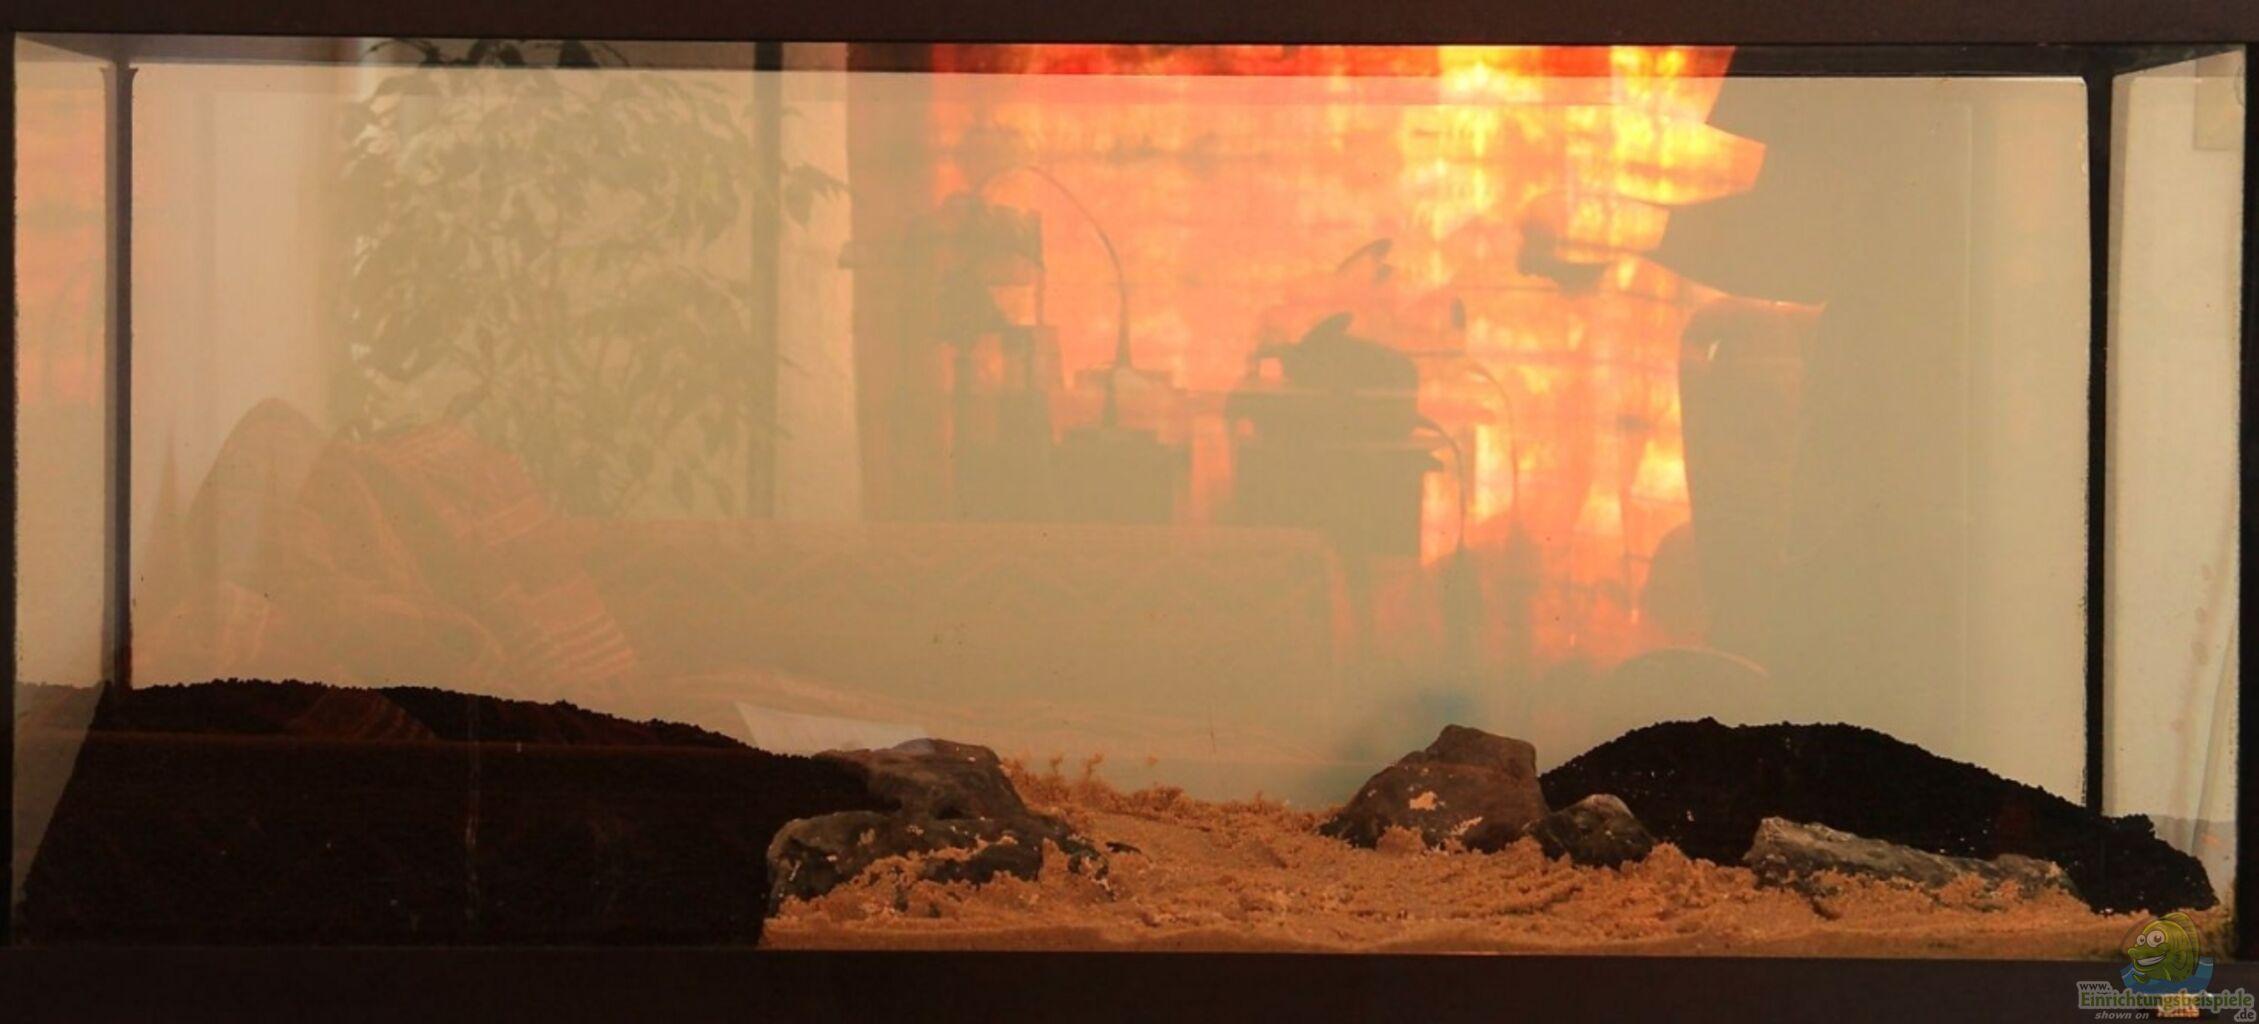 Flaming hot slot machine